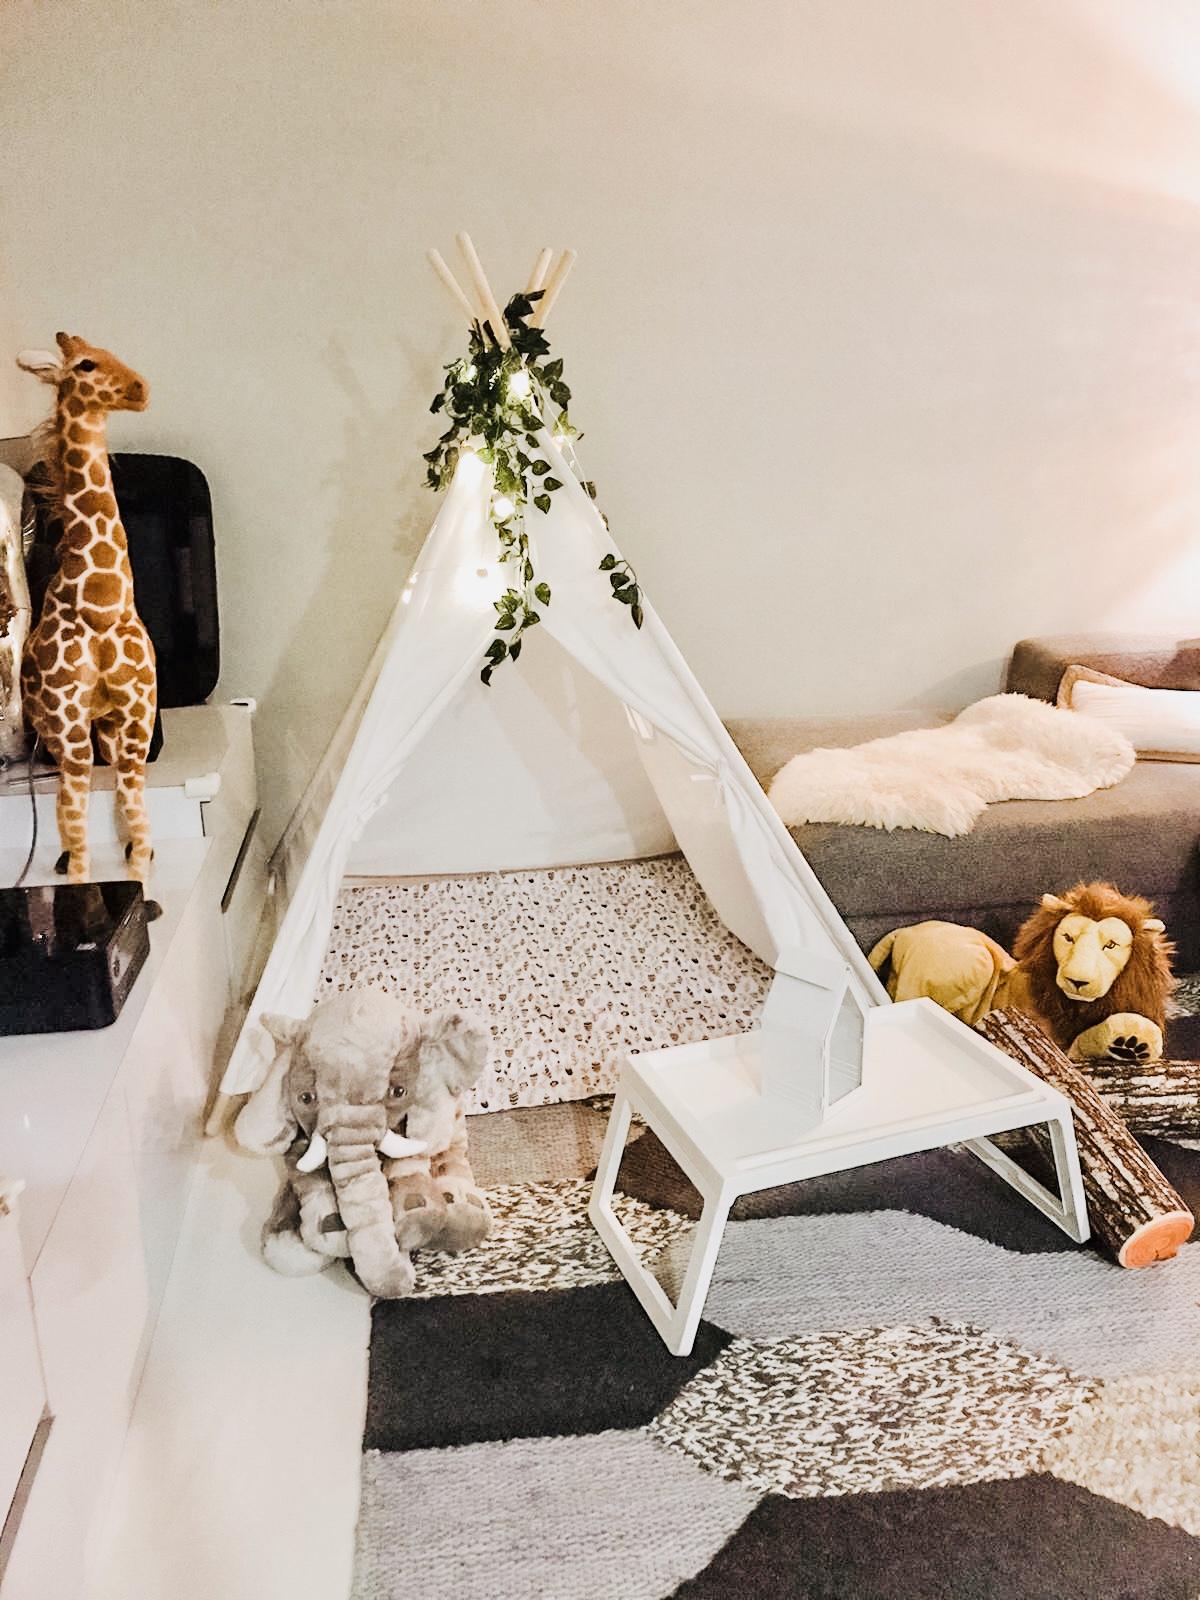 Wild Safari Tent